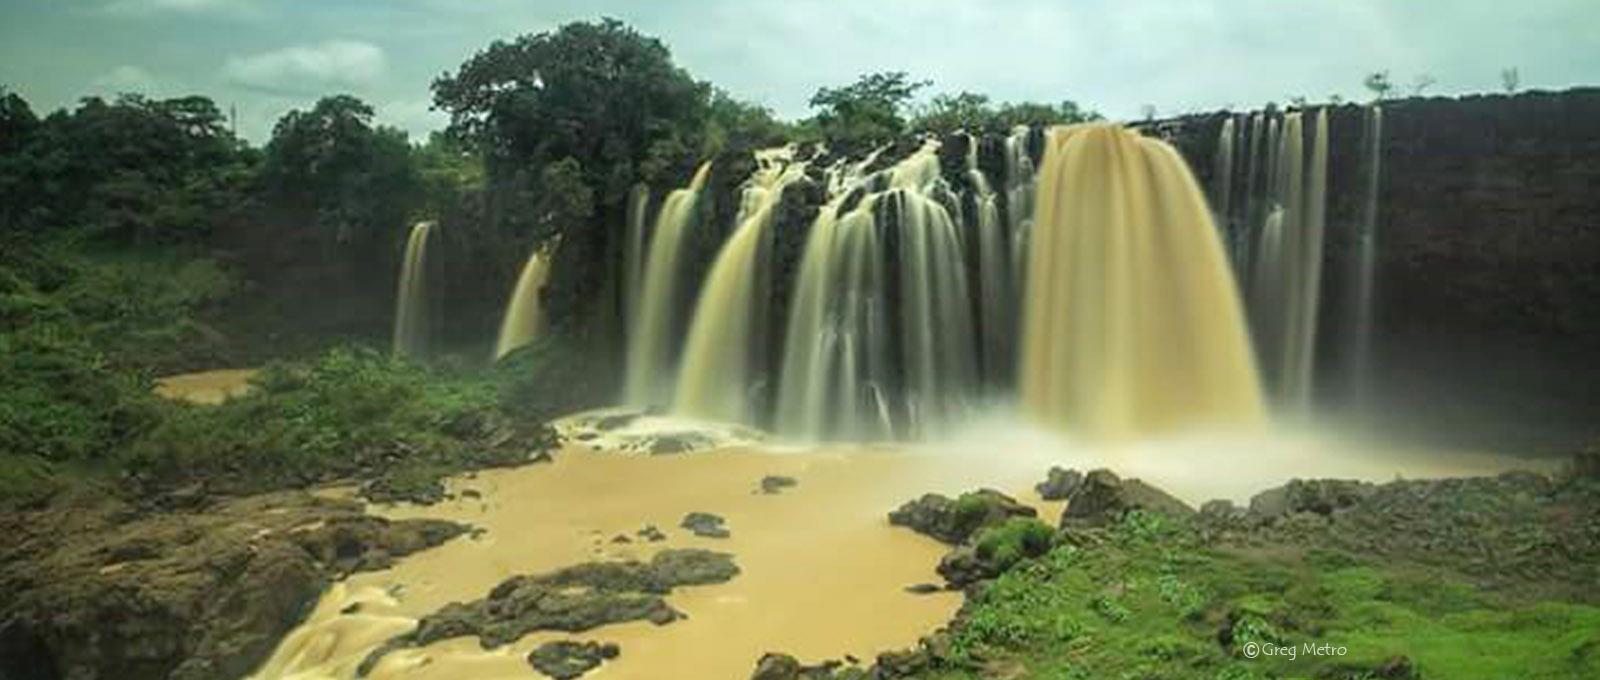 Blue Nile Falls, Bahirdar